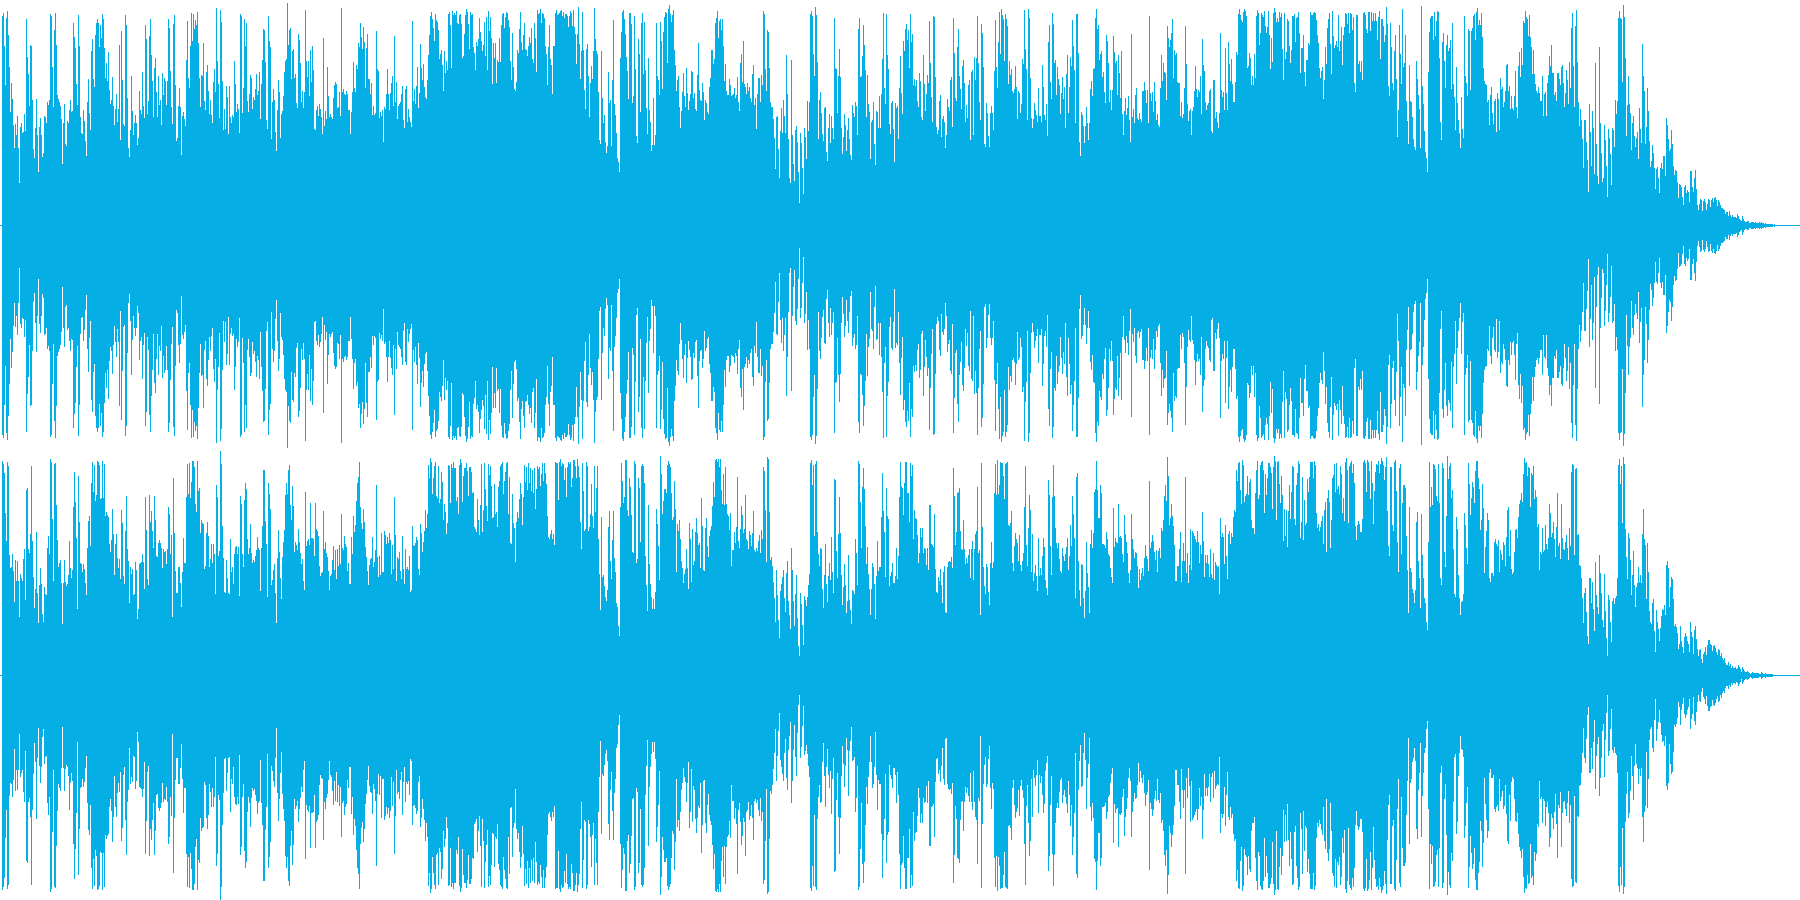 RPGバトル向けBGMの再生済みの波形